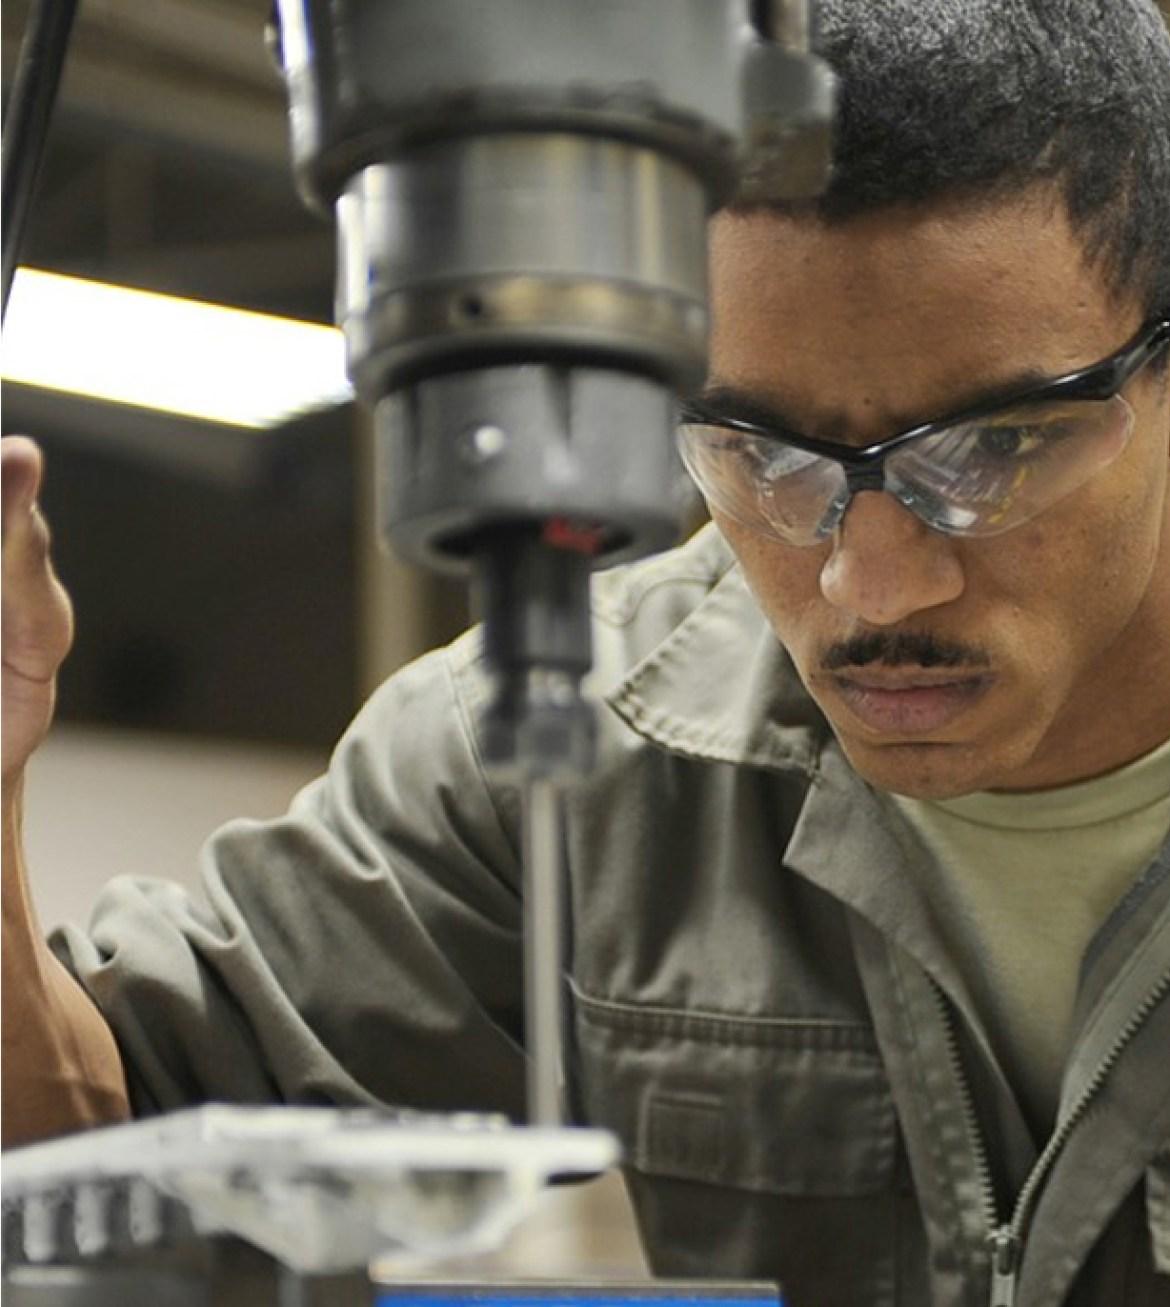 CNC Milling Service Capabilities